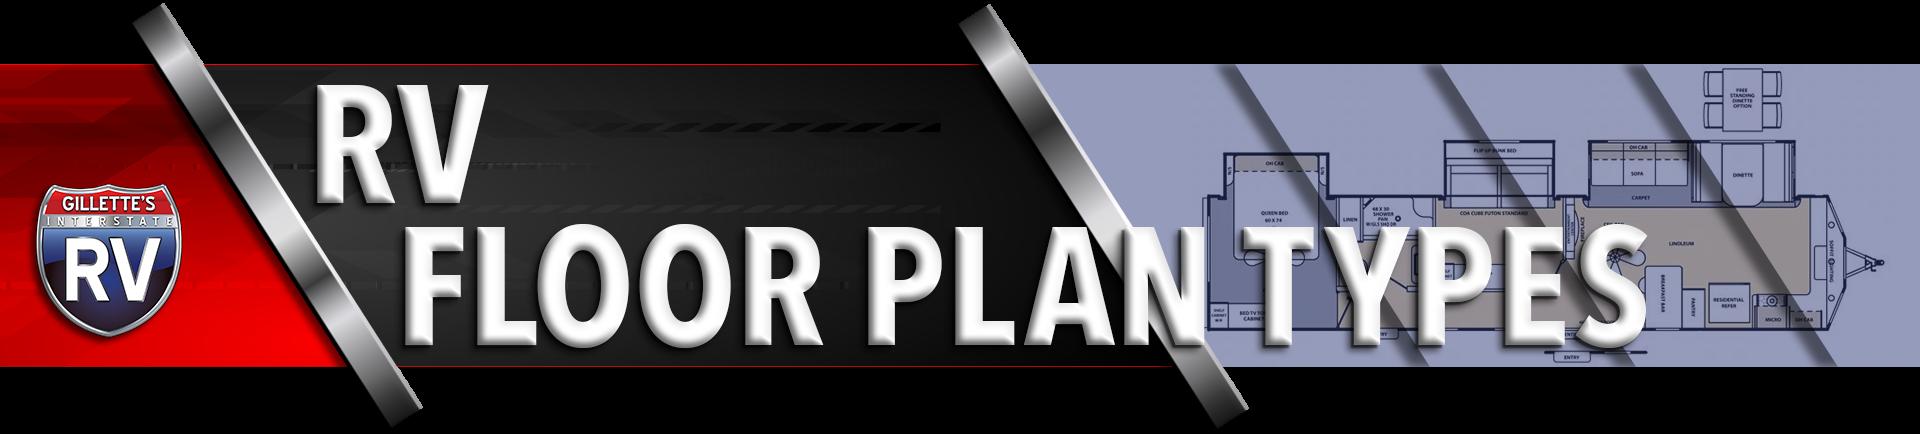 RV Floor Plan Types